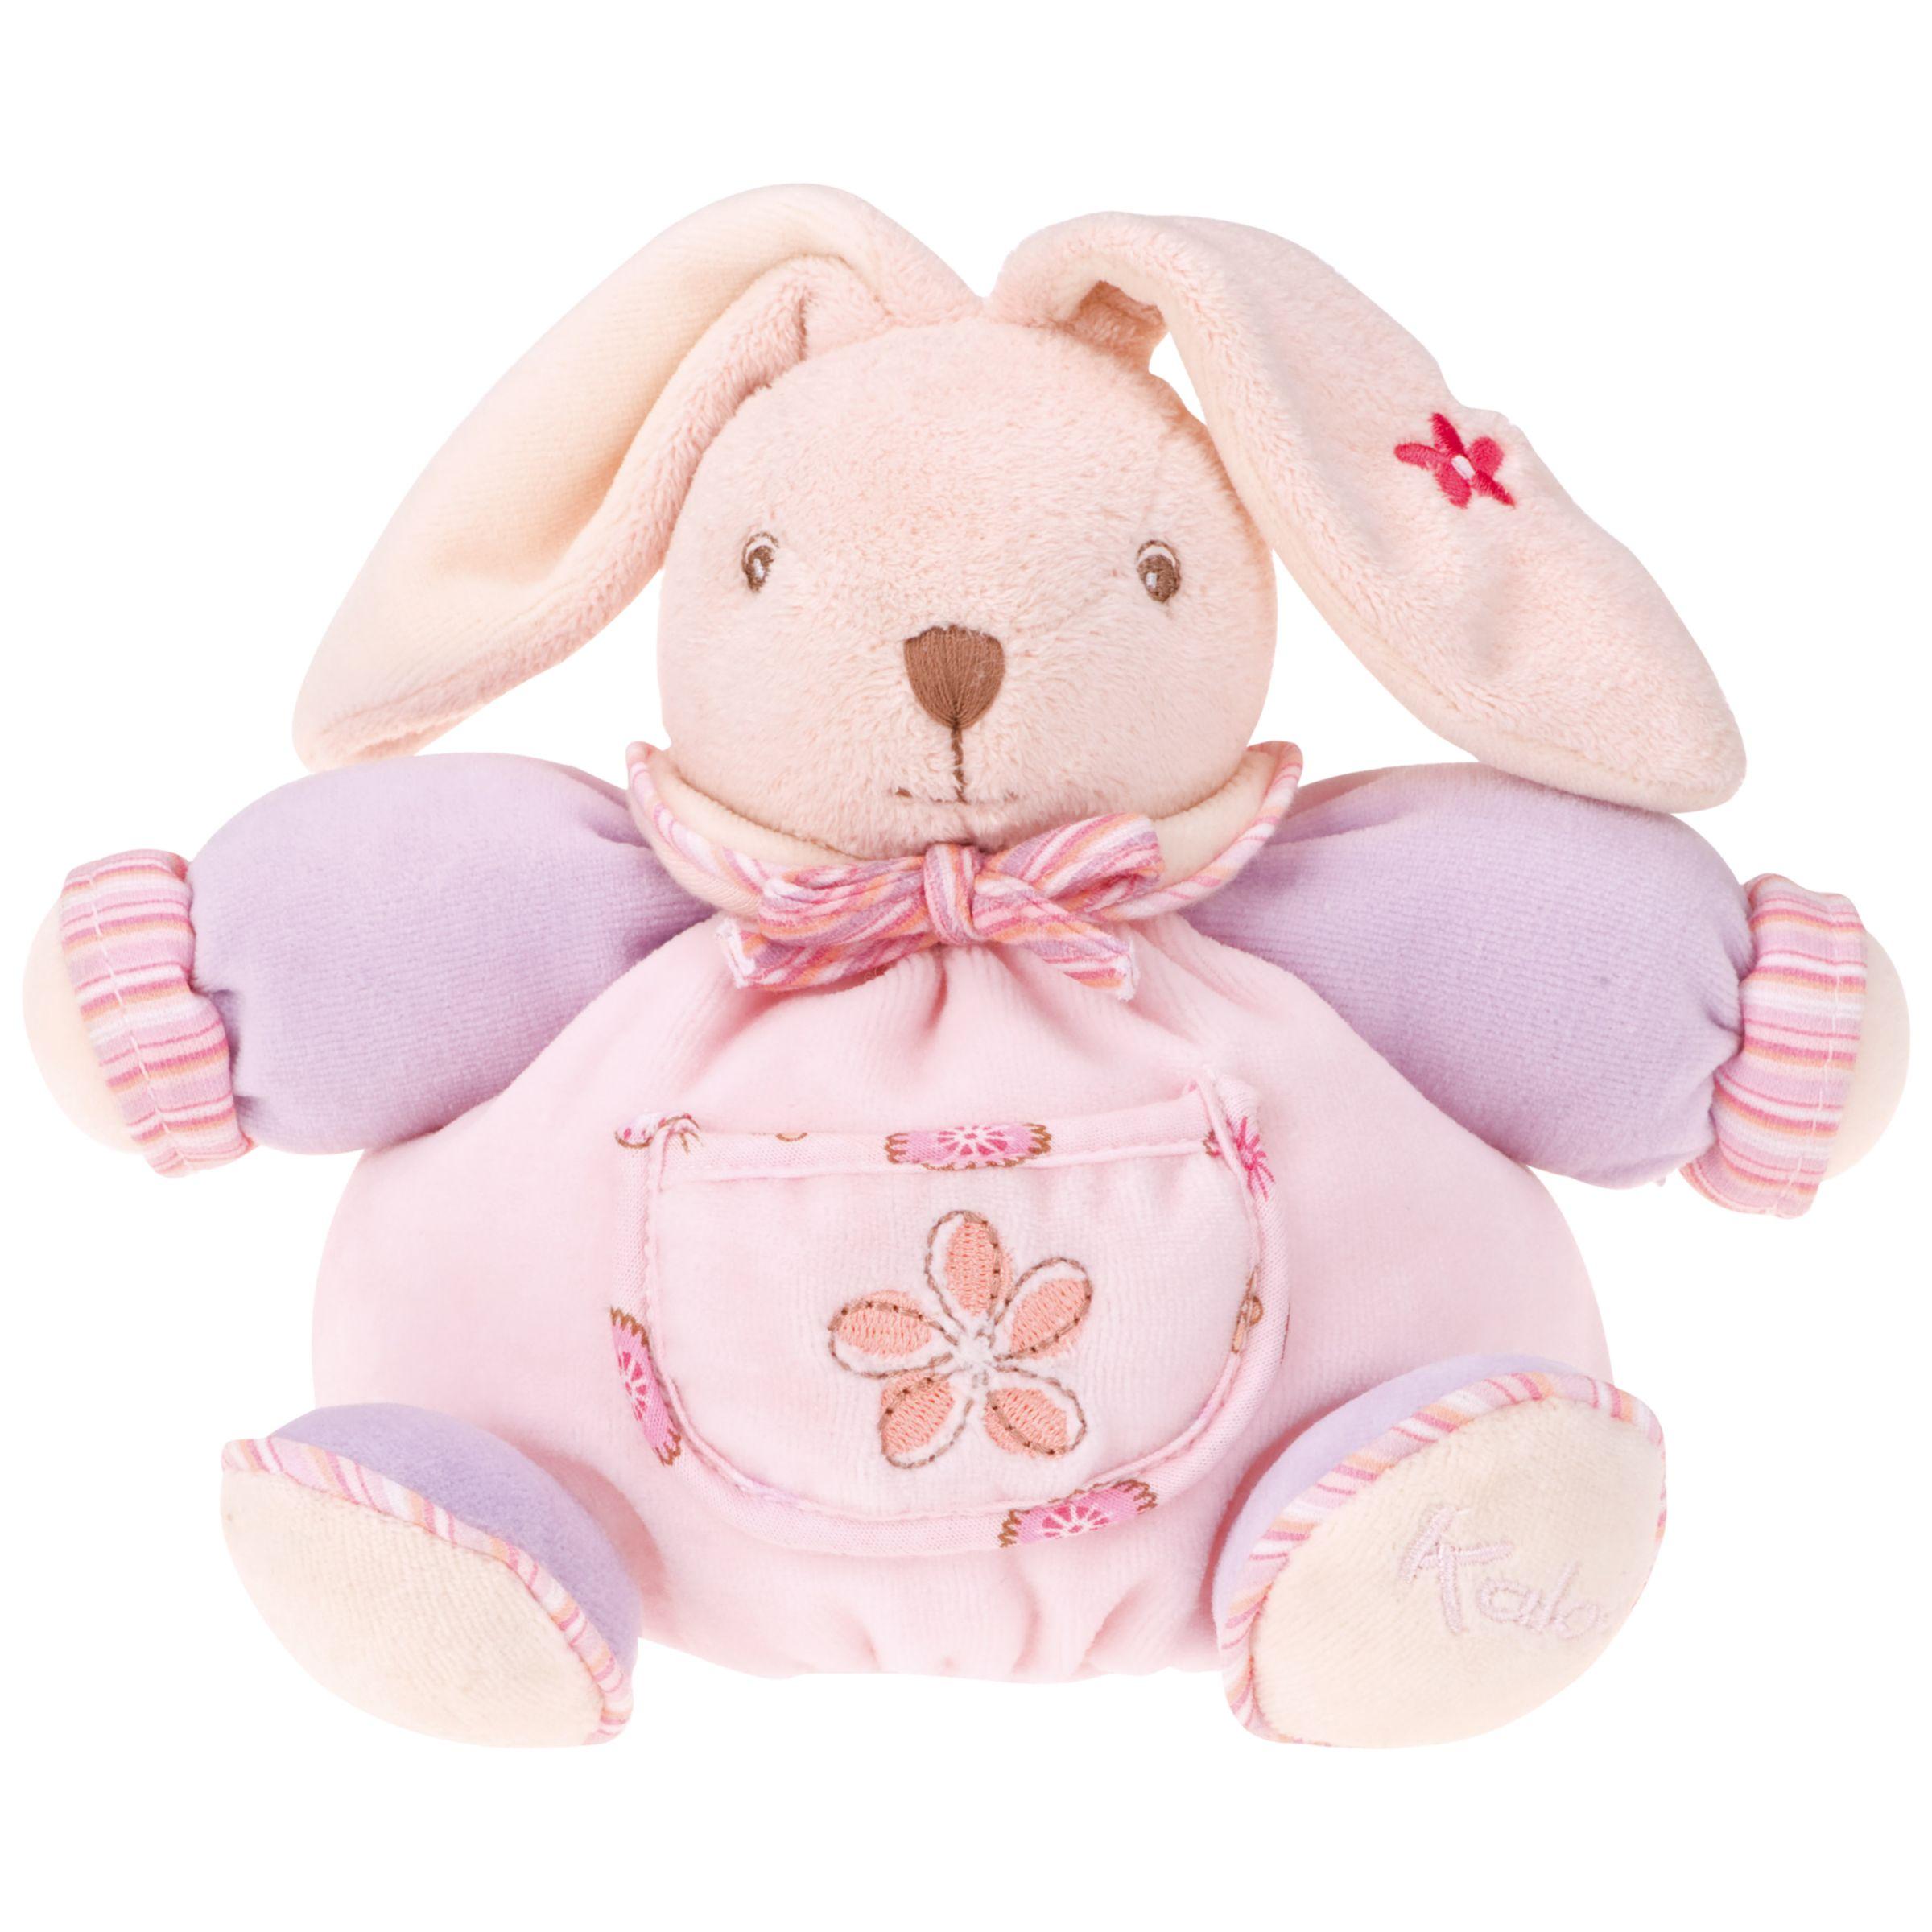 Kaloo Small Chubby Rabbit, Pink